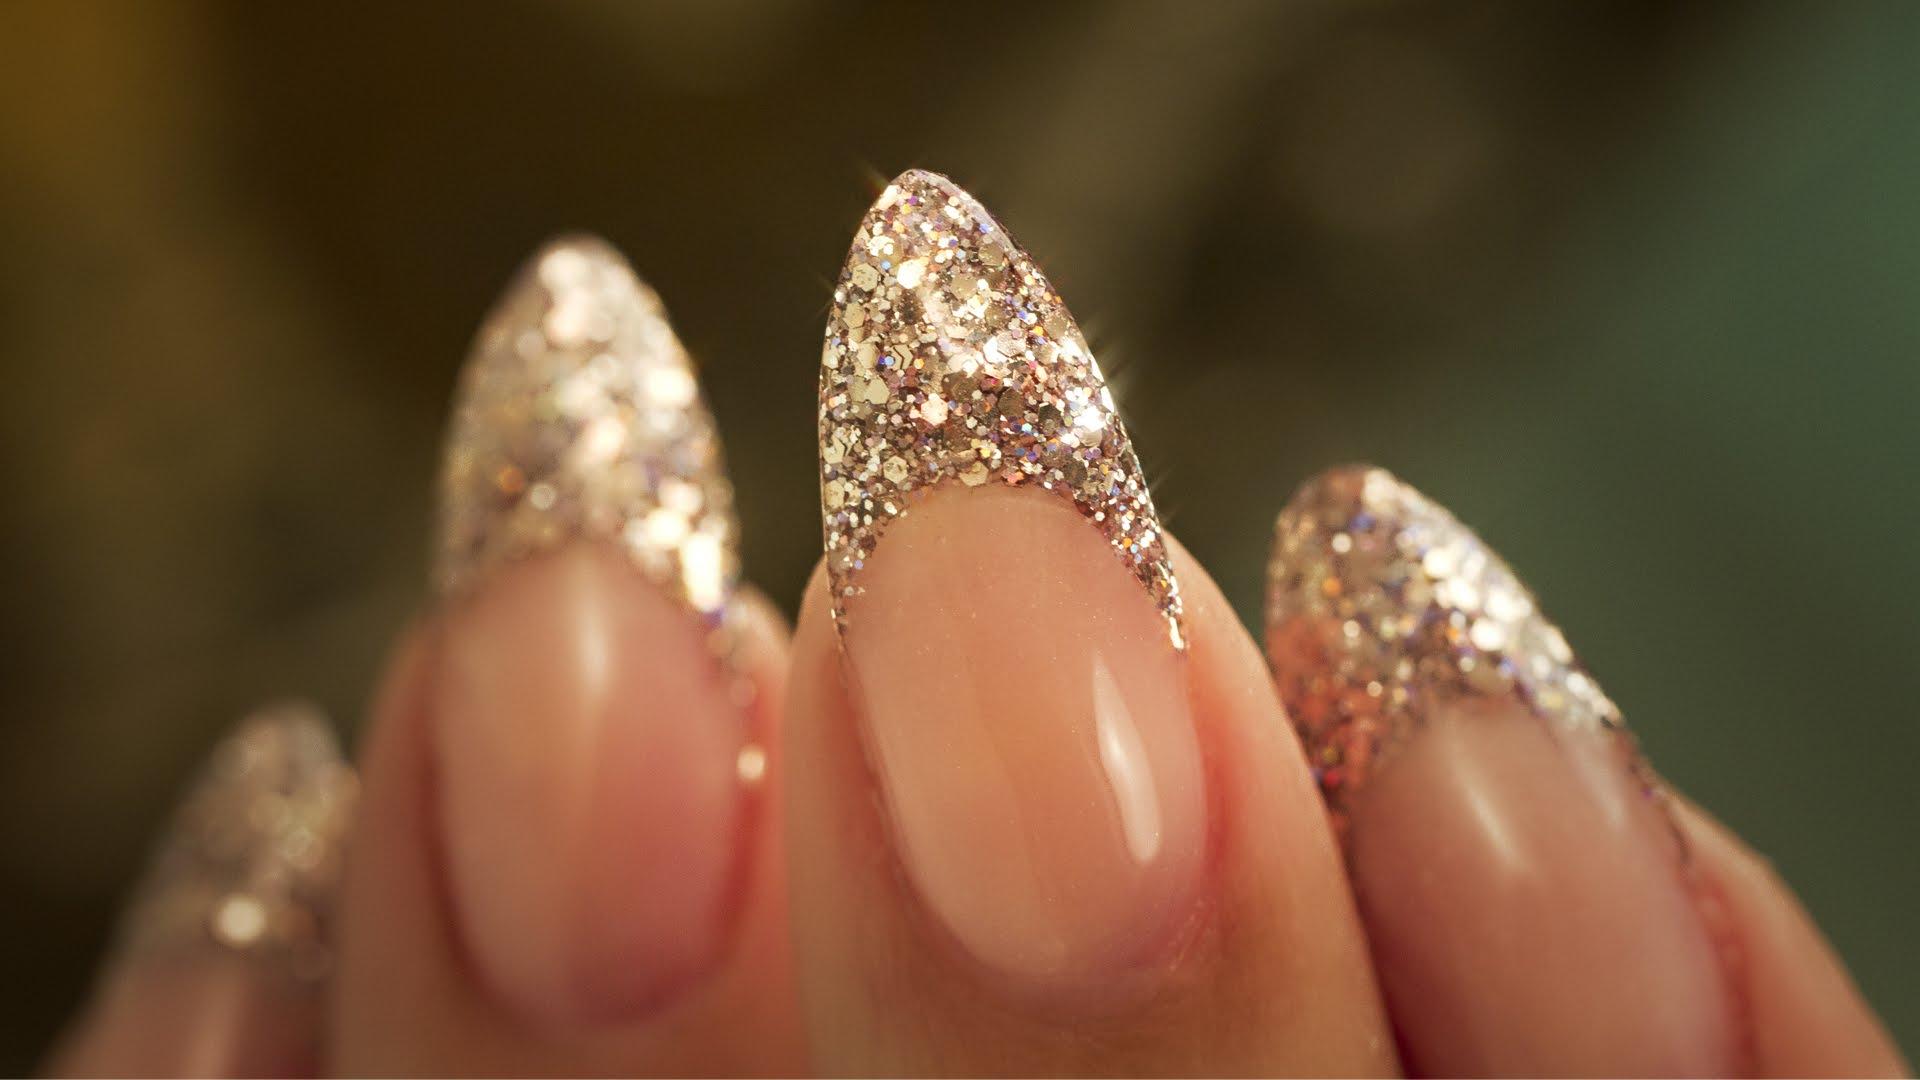 Encrusted Glitter Gel Nails